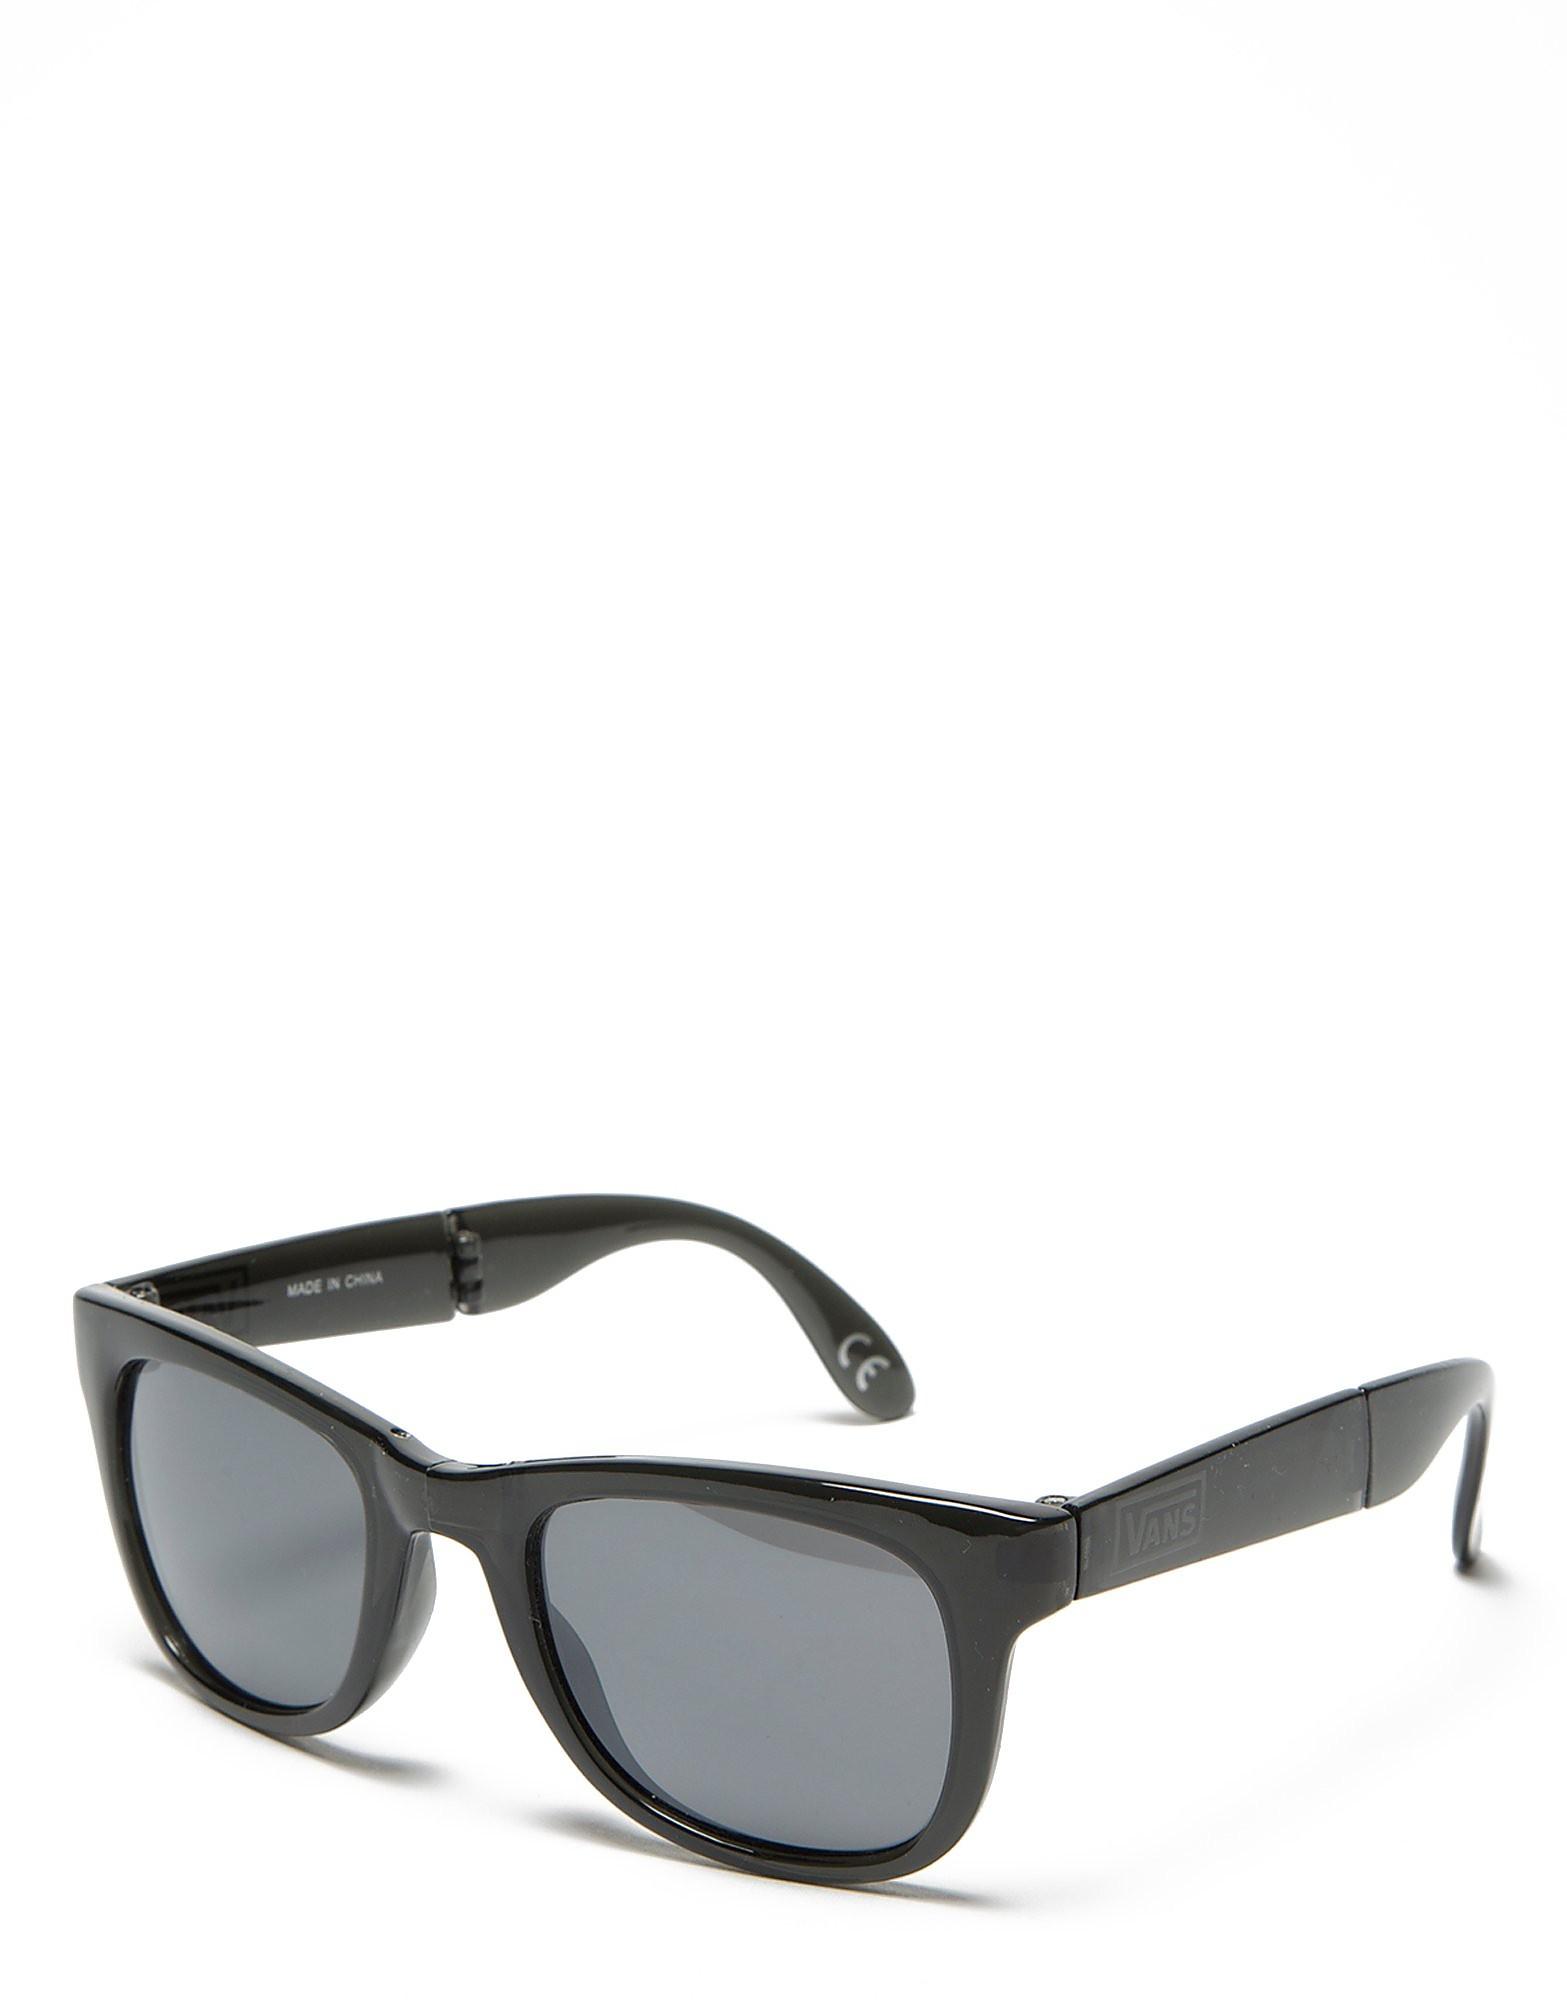 Vans Foldable Spicoli Sunglasses